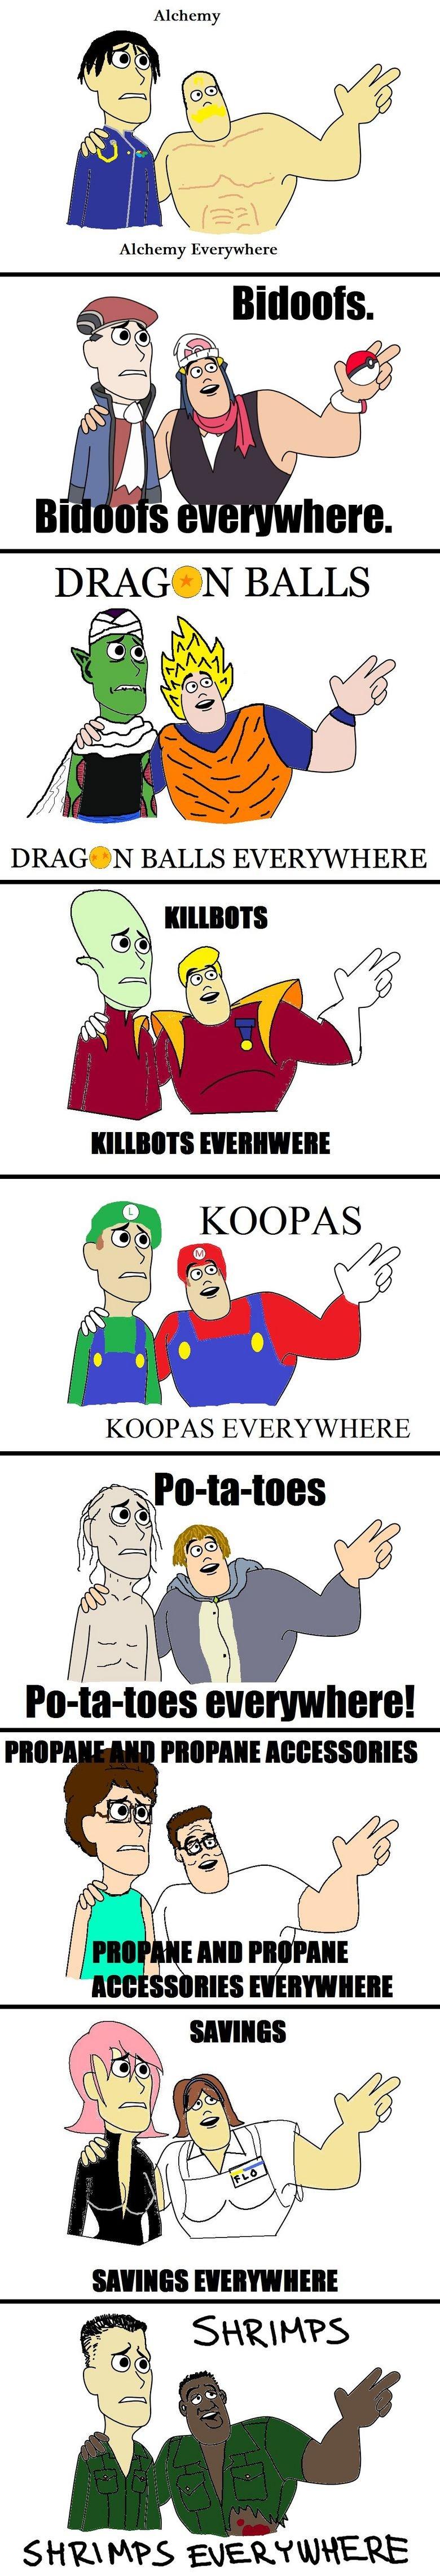 Memes Everywhere Toy Story Toys Toys Everywhere Meme Toy